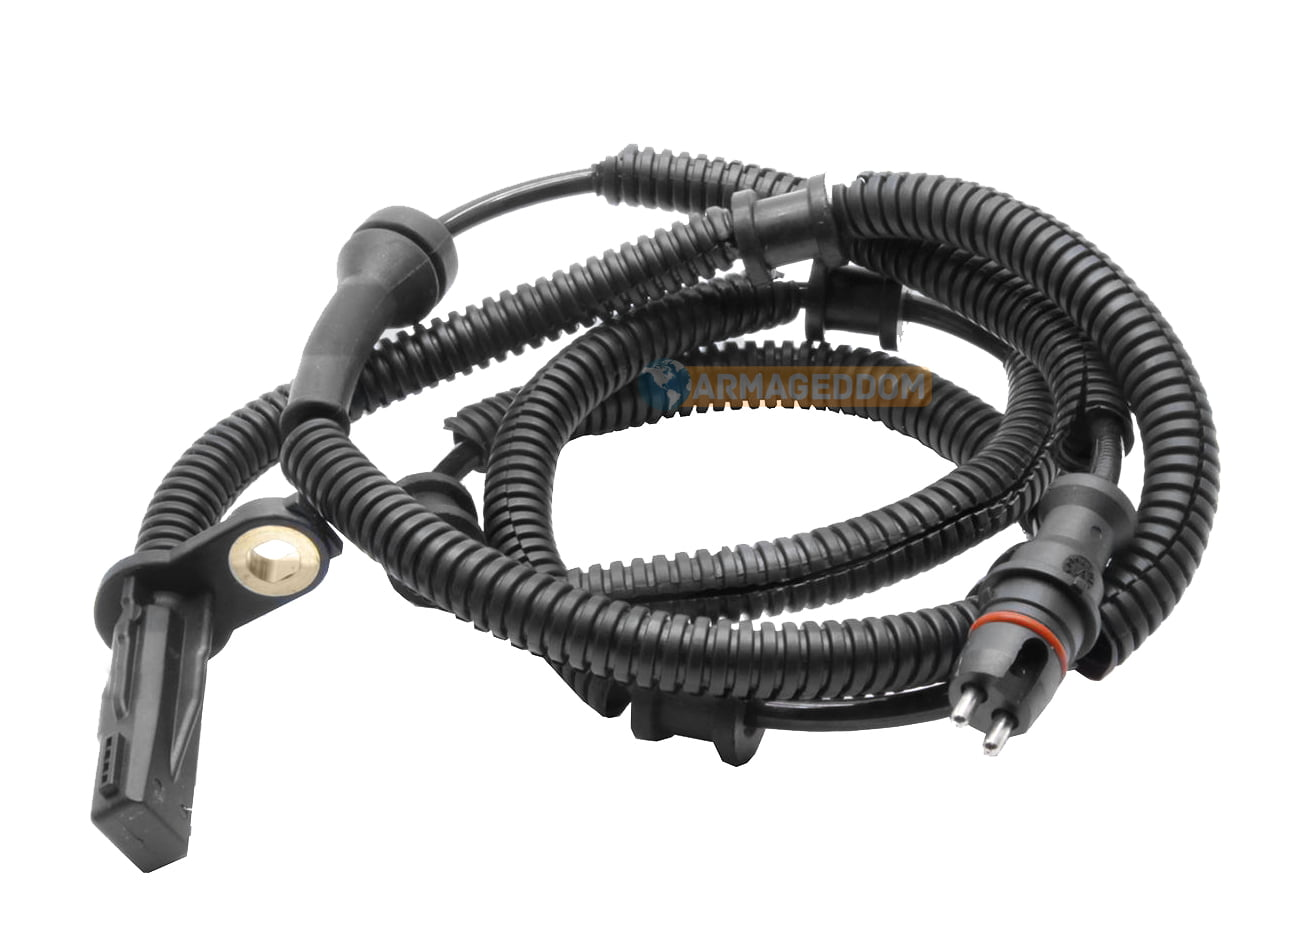 Sensor Freio Abs Roda Traseira Renault Master 2000 Até 2012